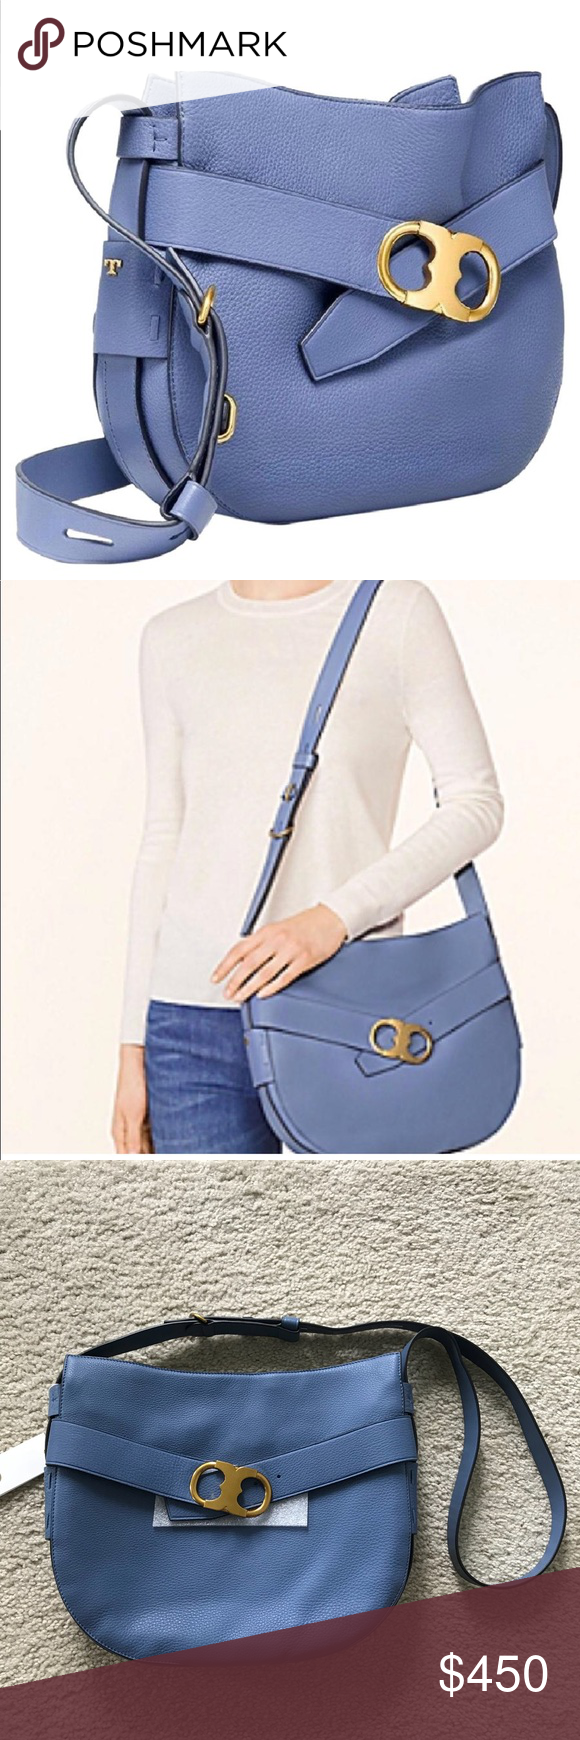 22ba9091a14 Spotted while shopping on Poshmark  Tory Burch Gemini Link Shoulder Bag!   poshmark  fashion  shopping  style  Tory Burch  Handbags